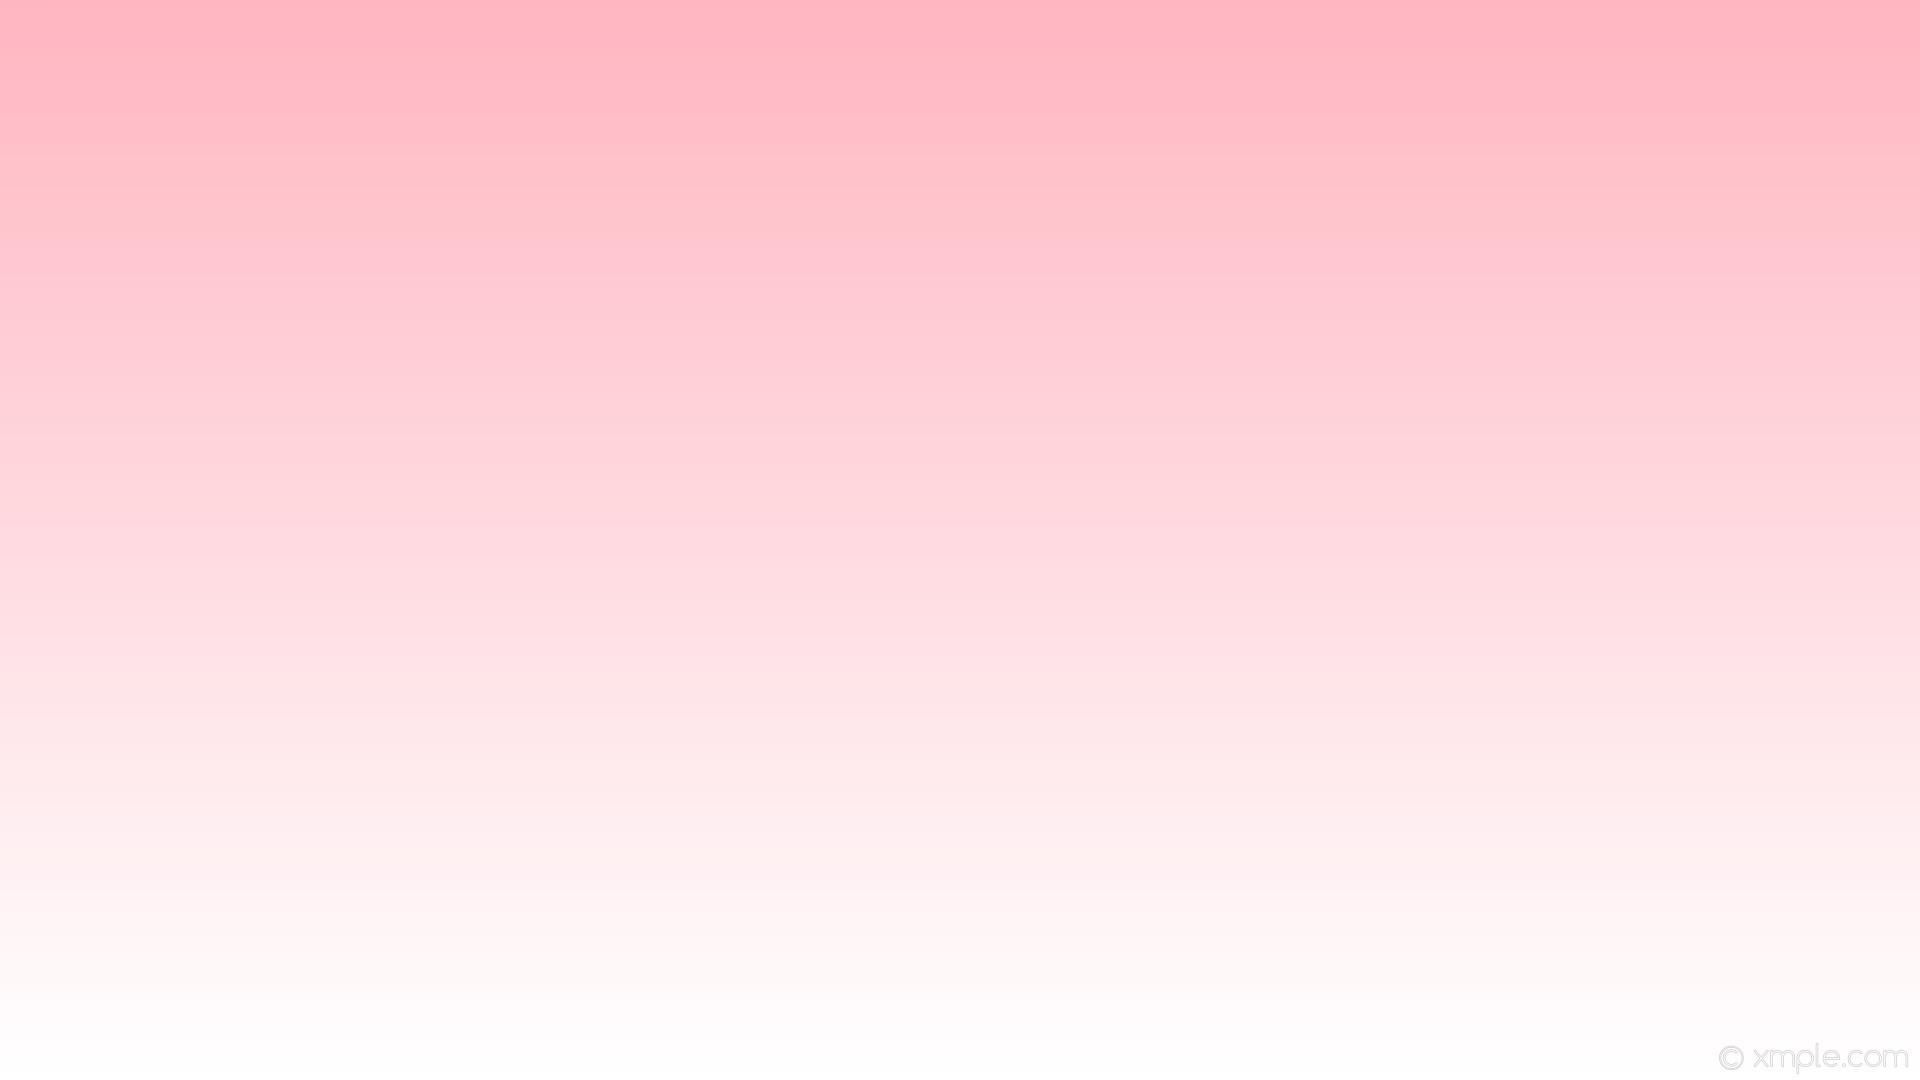 light pink wallpaper (72+ images)